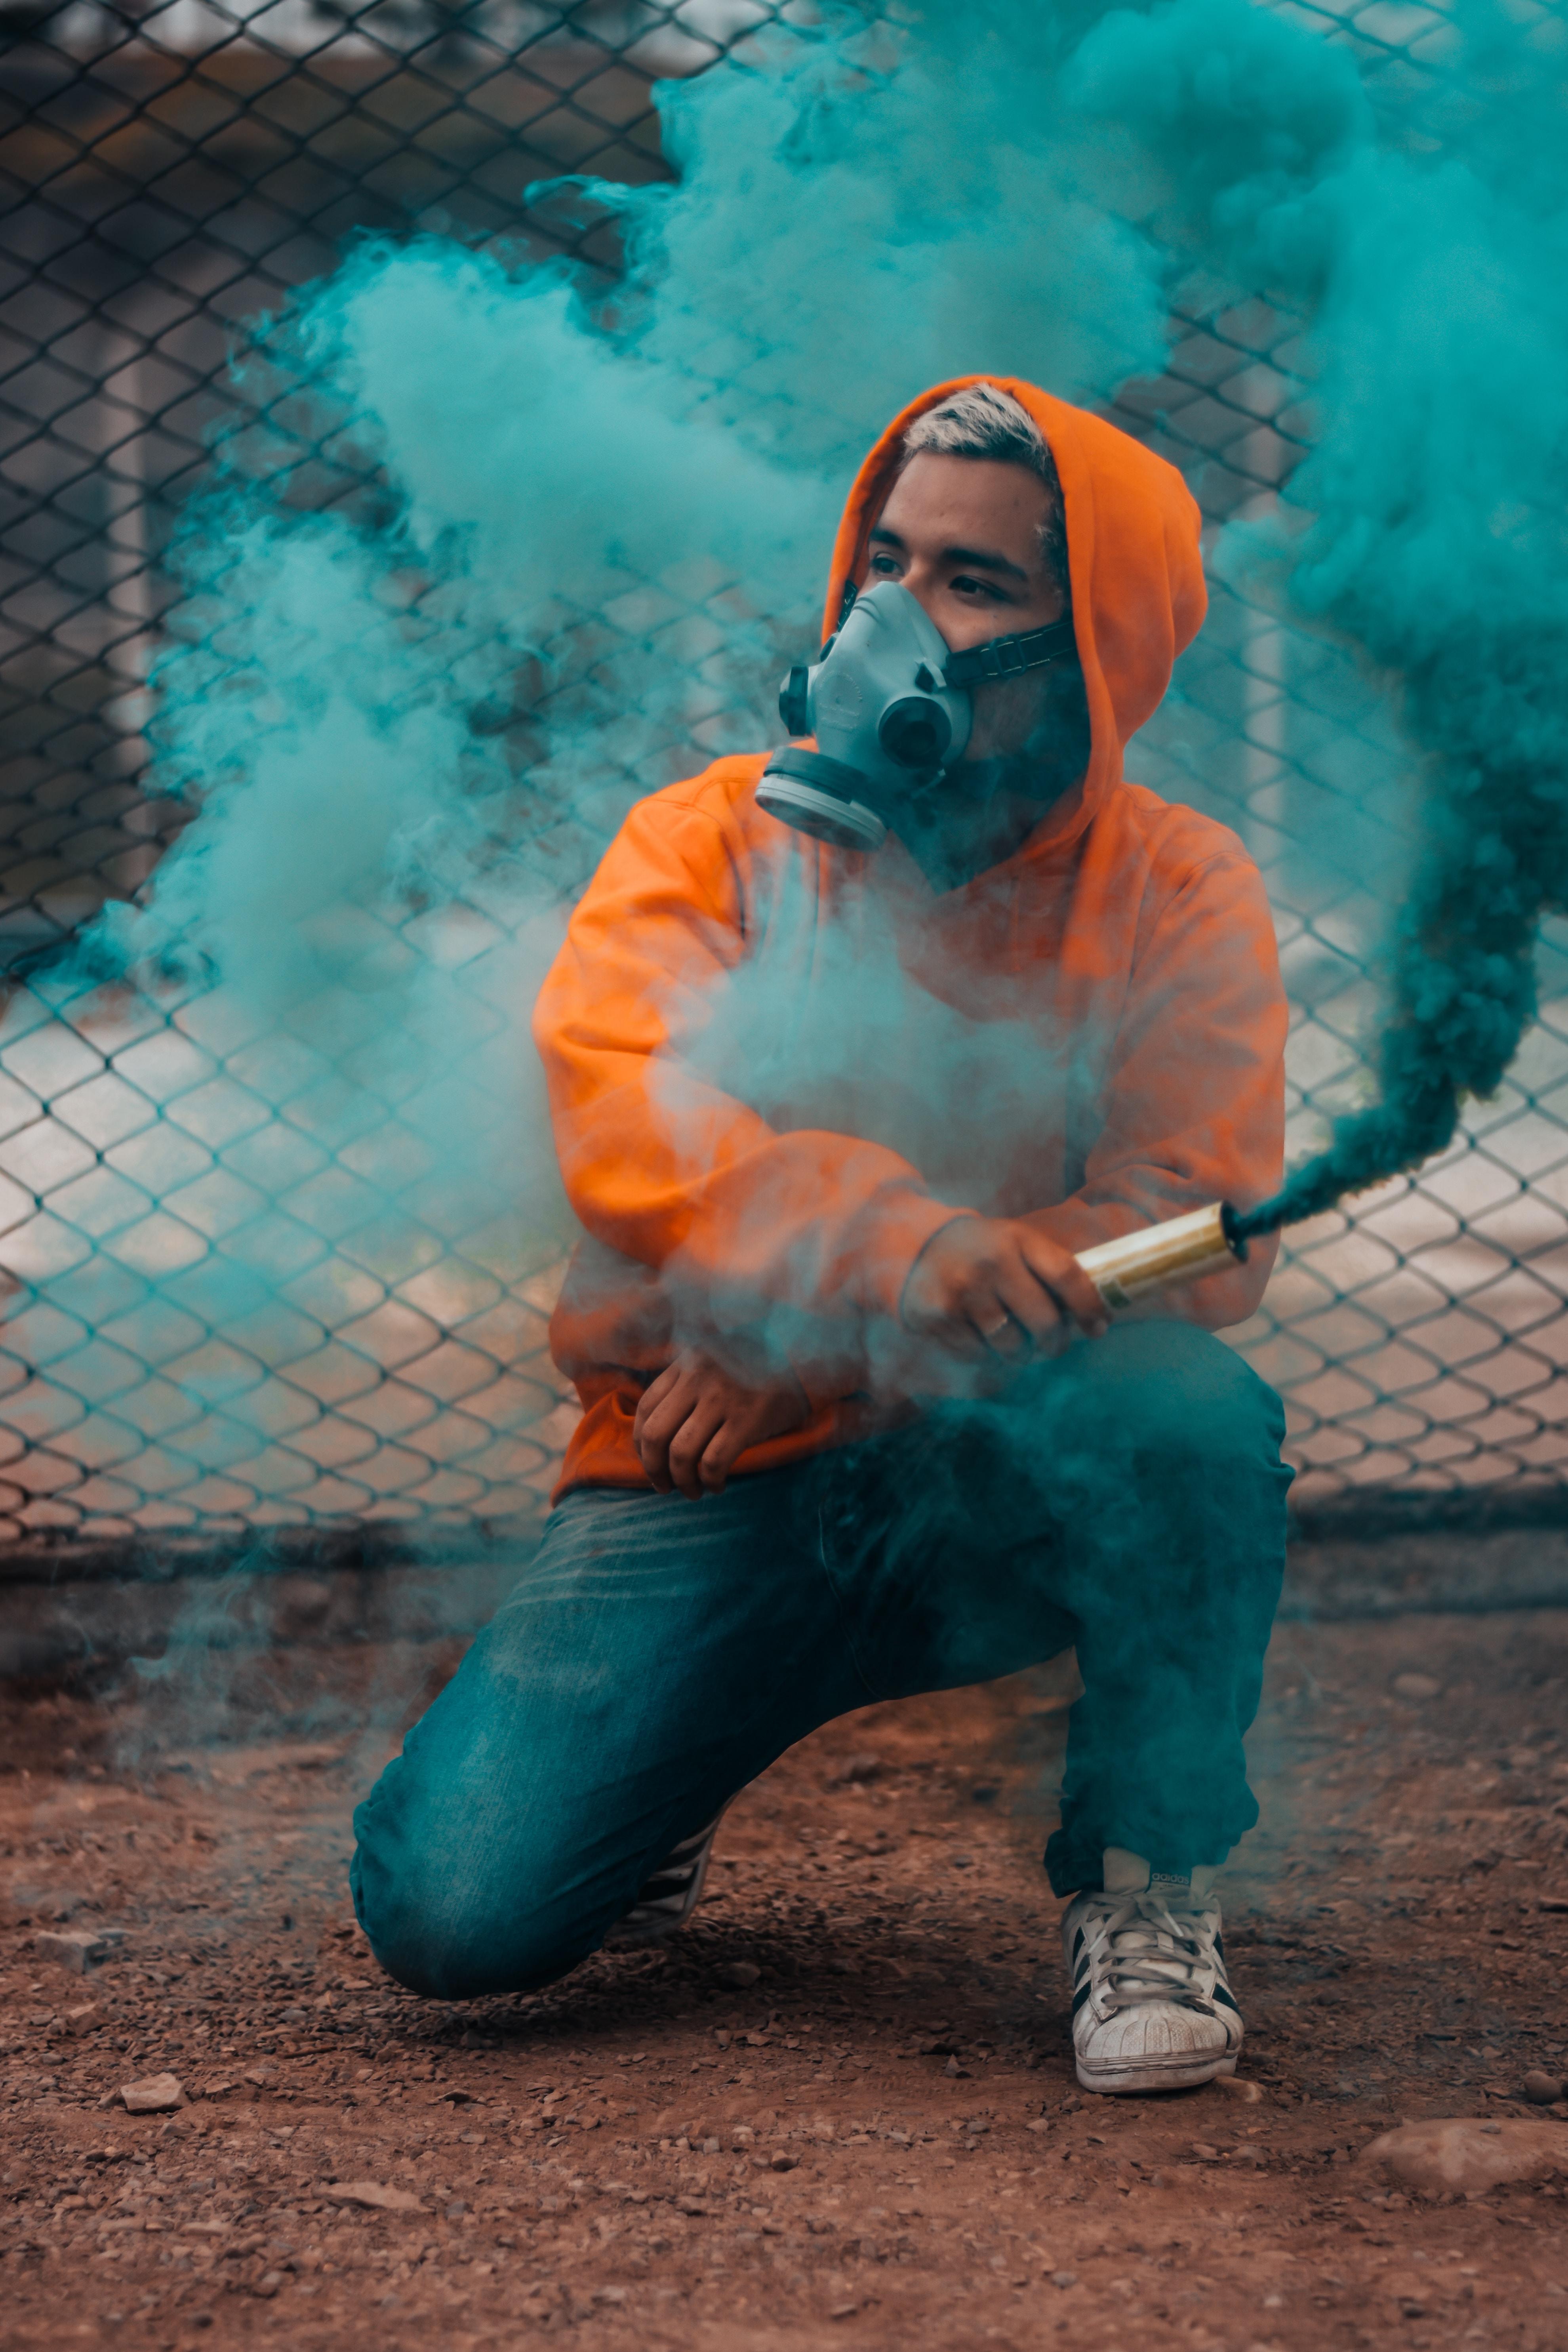 man holding tube with green smoke during daytime photo